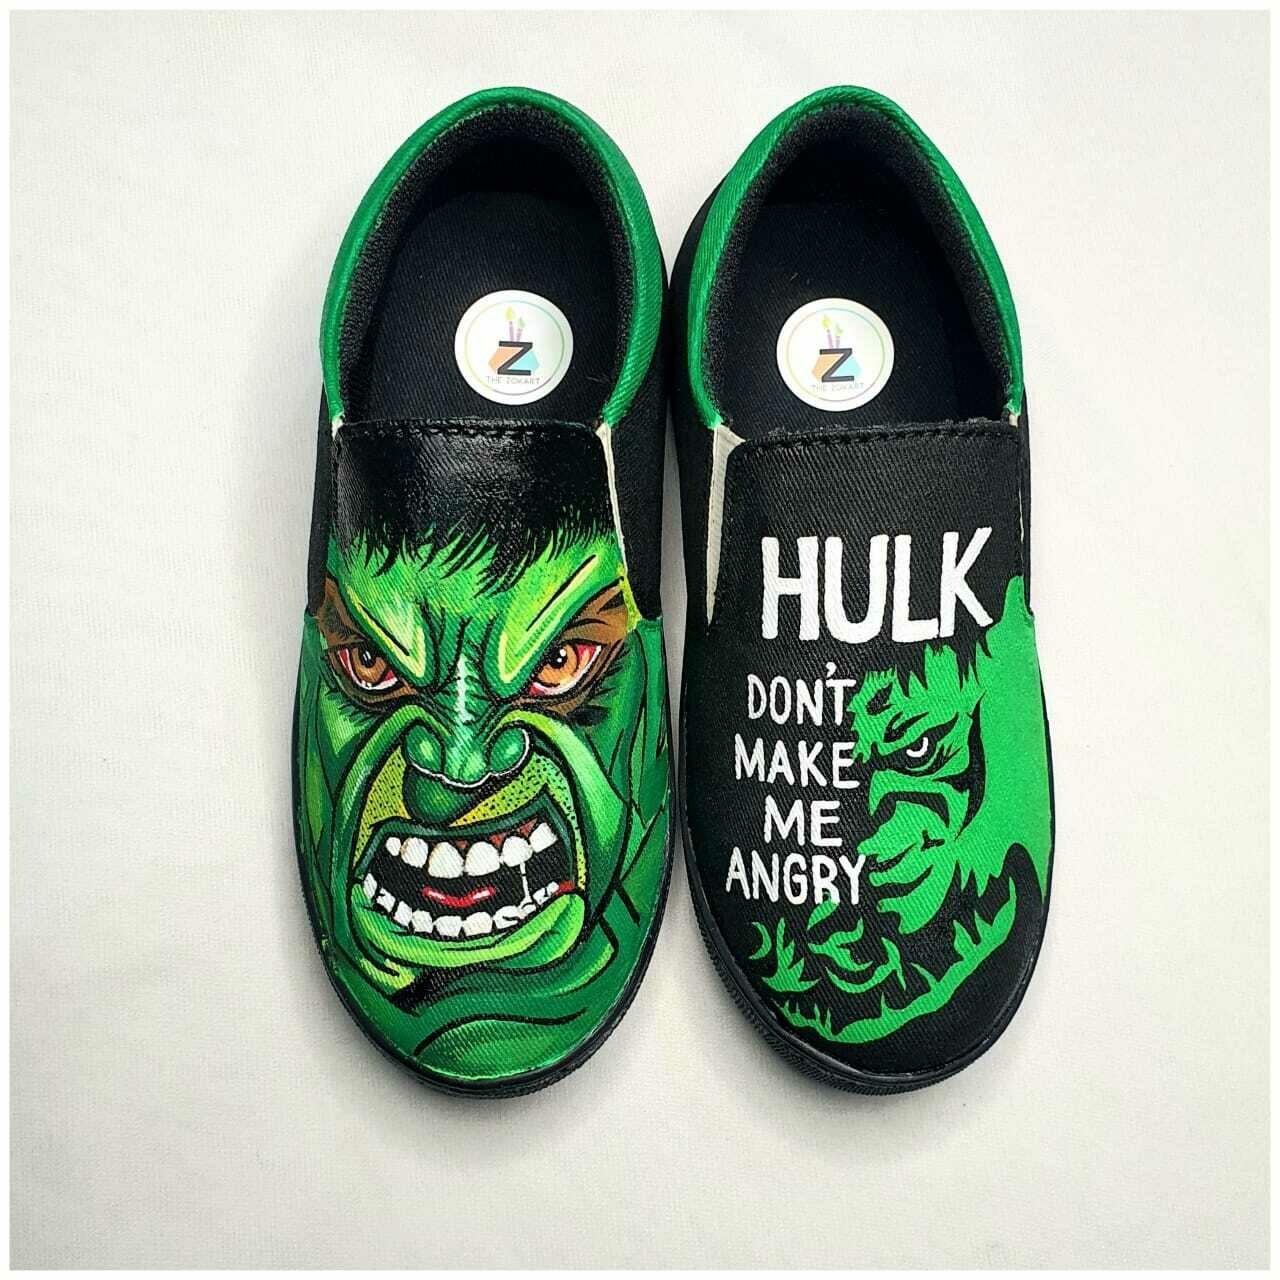 Hulk Don't make me angry